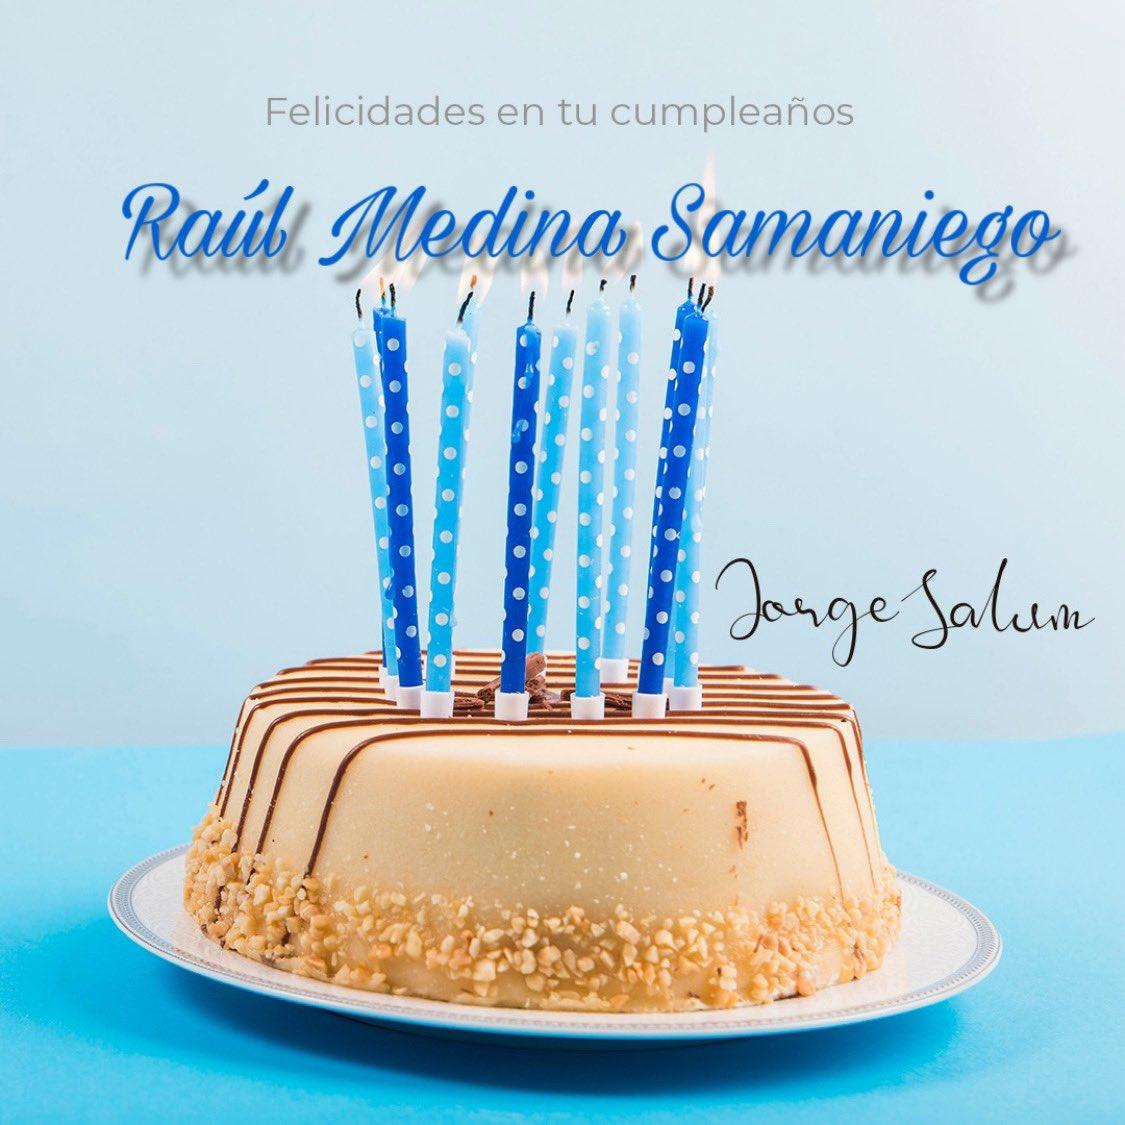 JorgeSalum photo